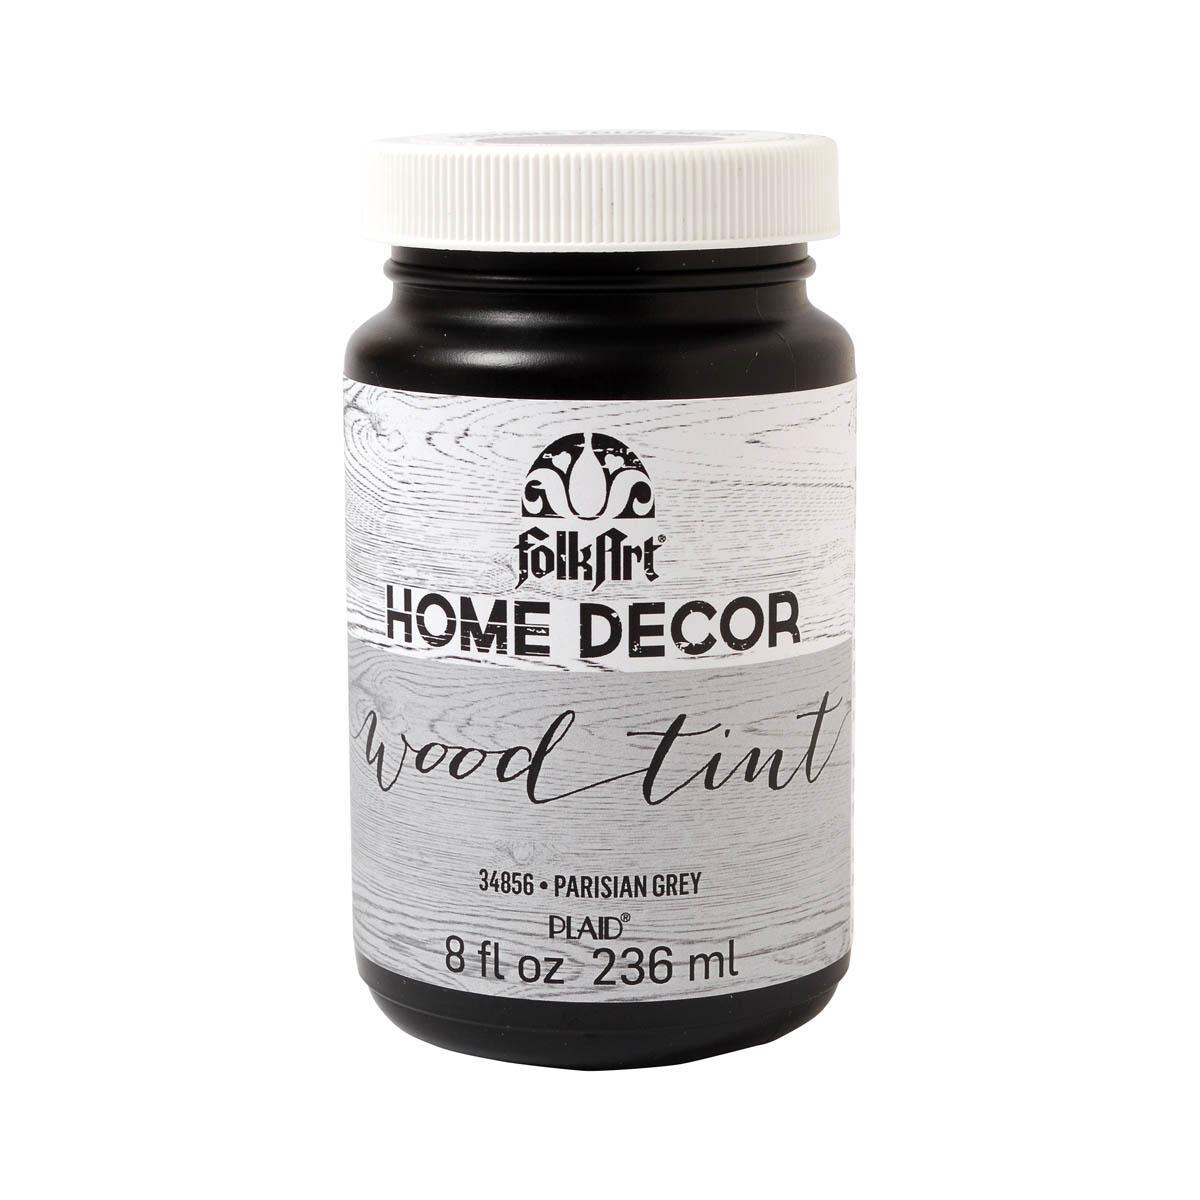 FolkArt ® Home Decor™ Wood Tint - Parisian Grey, 8 oz. - 34856